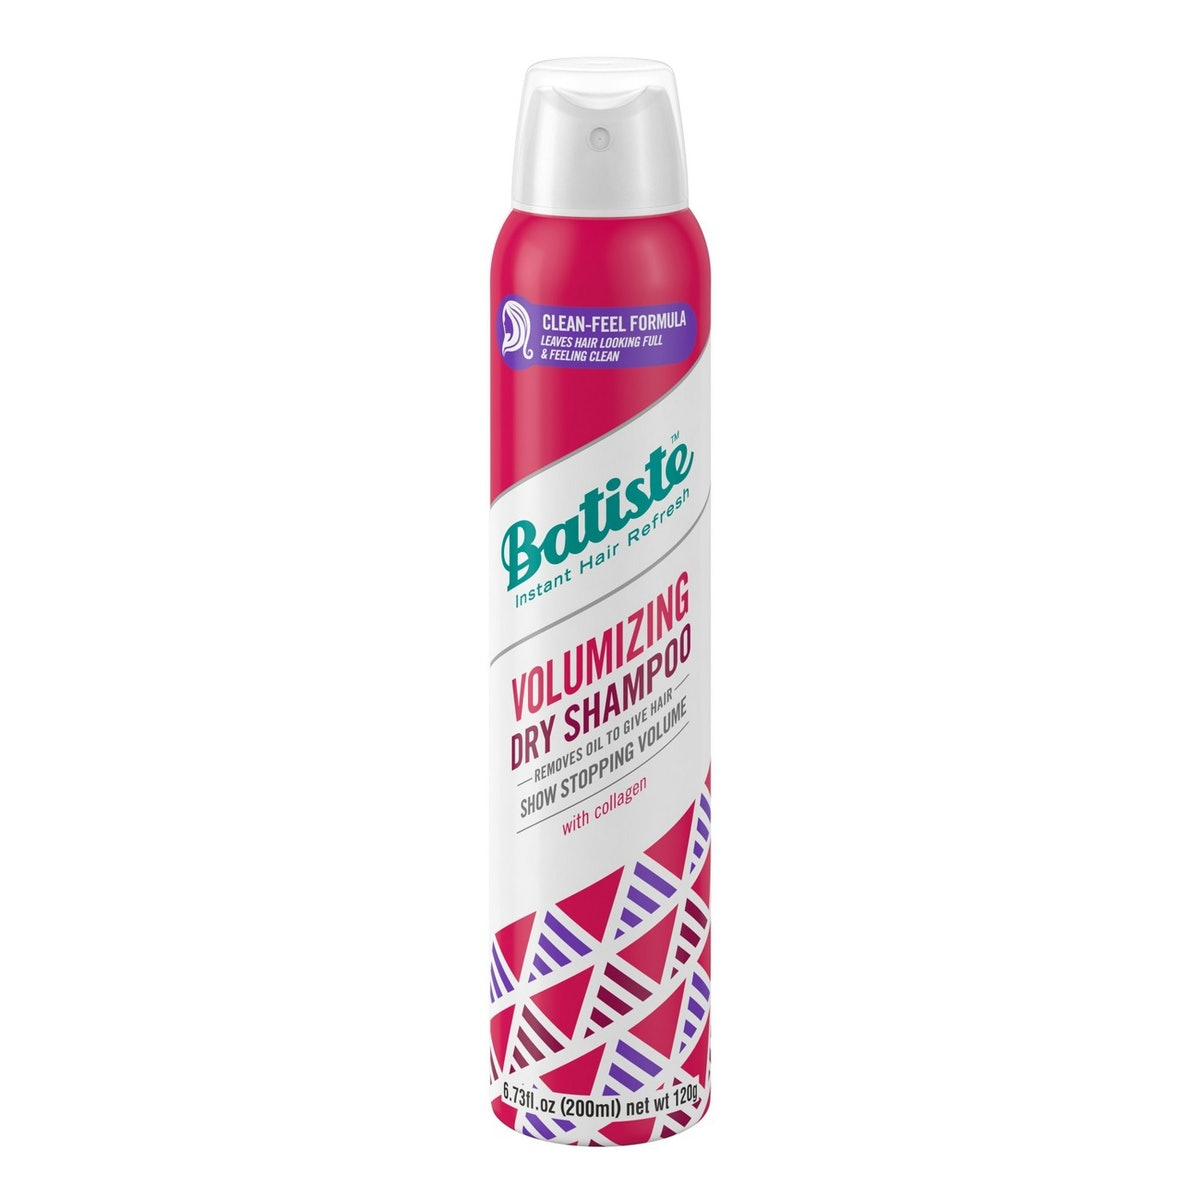 Batiste Volumizing Dry Shampoo